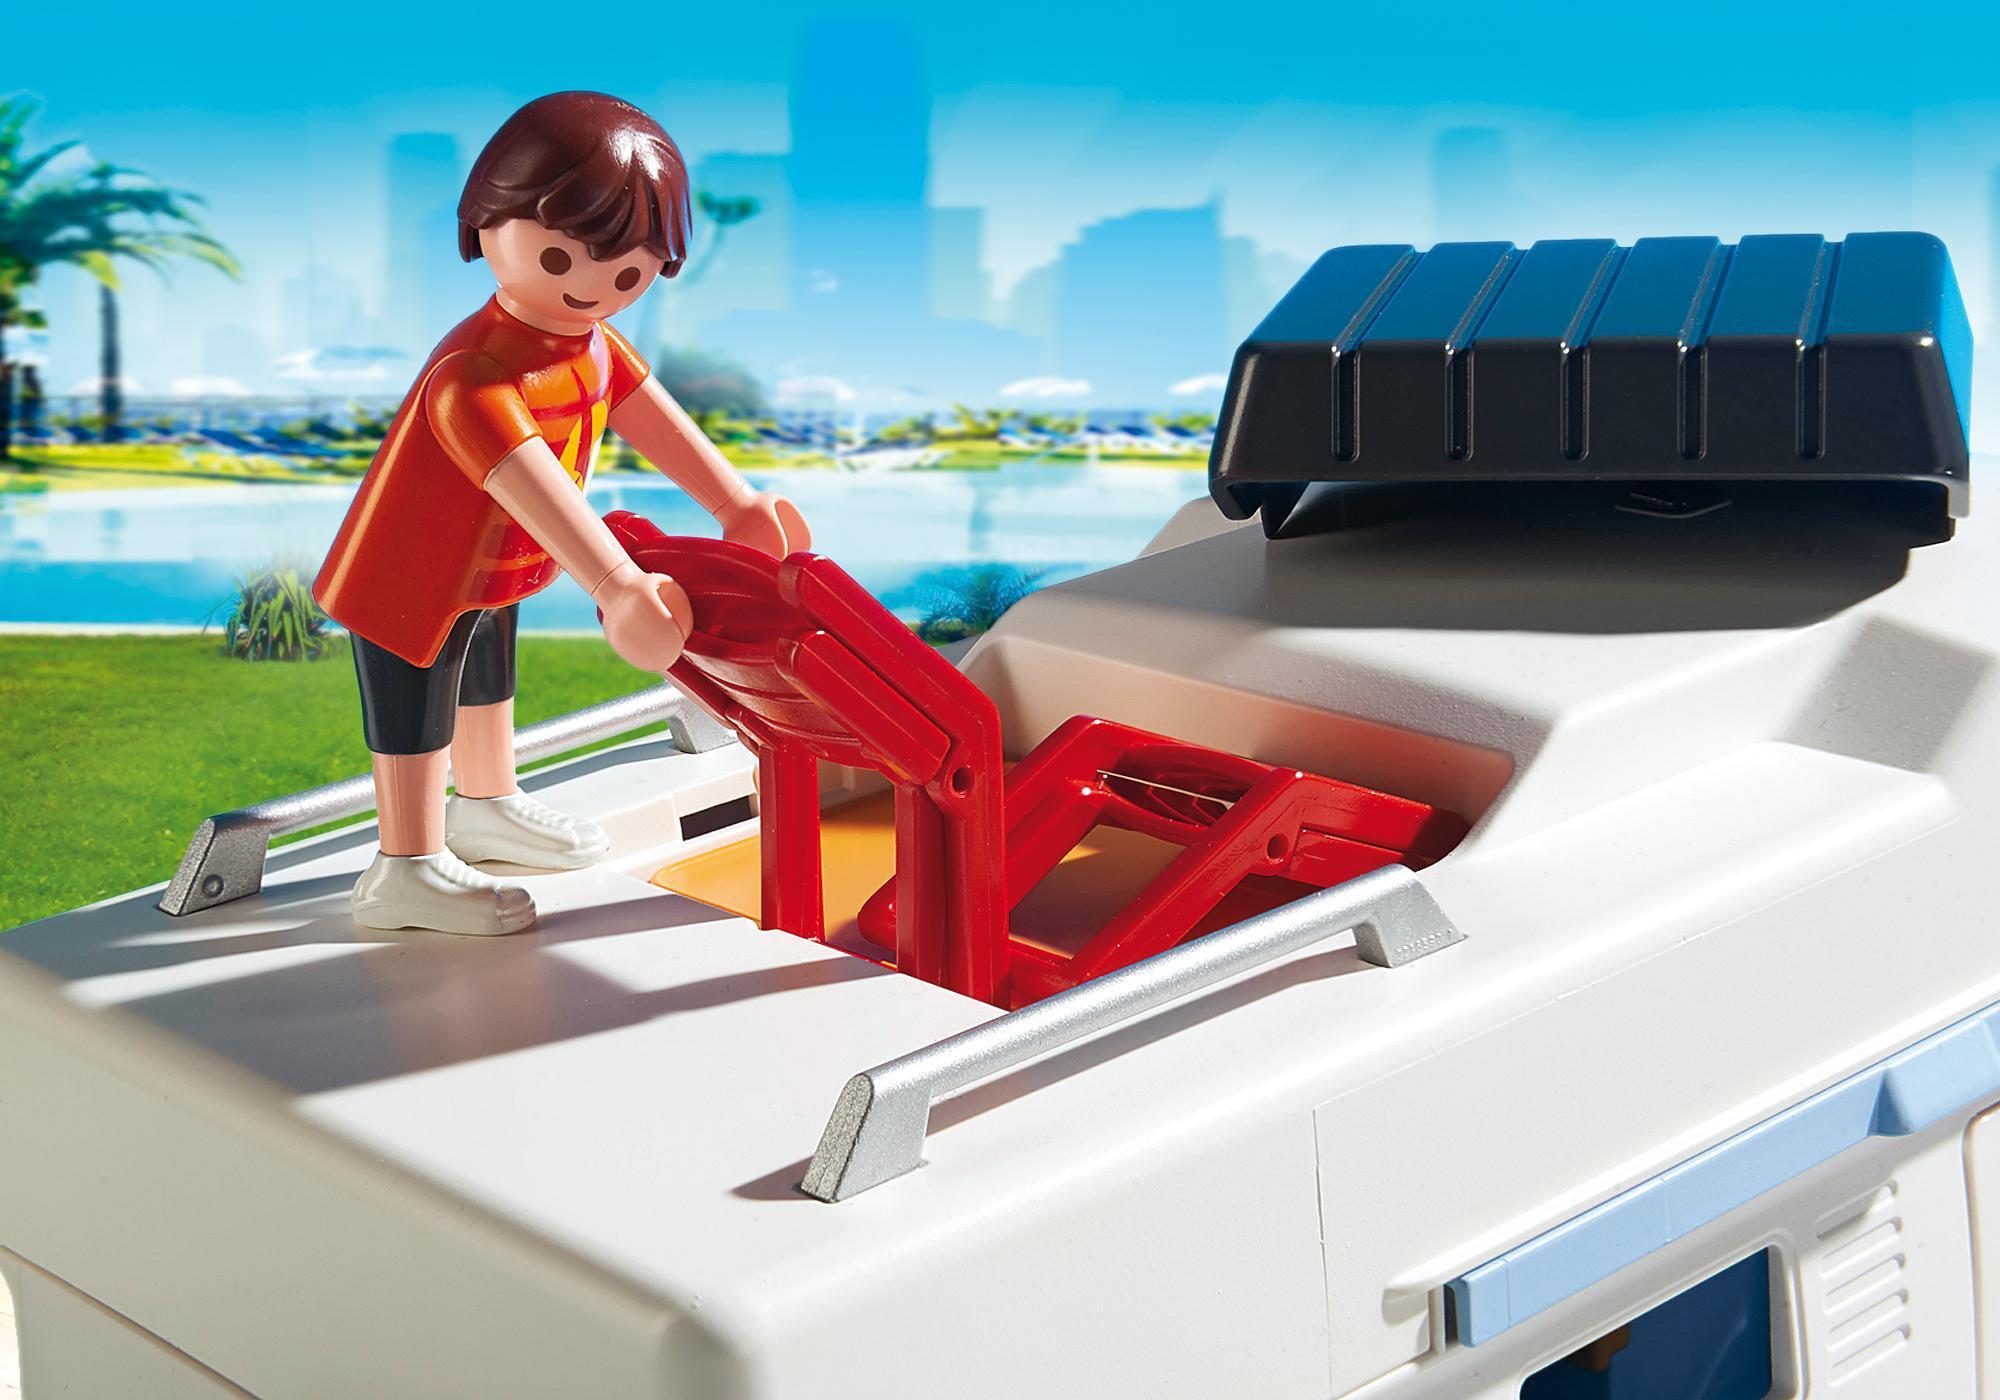 http://media.playmobil.com/i/playmobil/6671_product_extra2/Familien-Wohnmobil